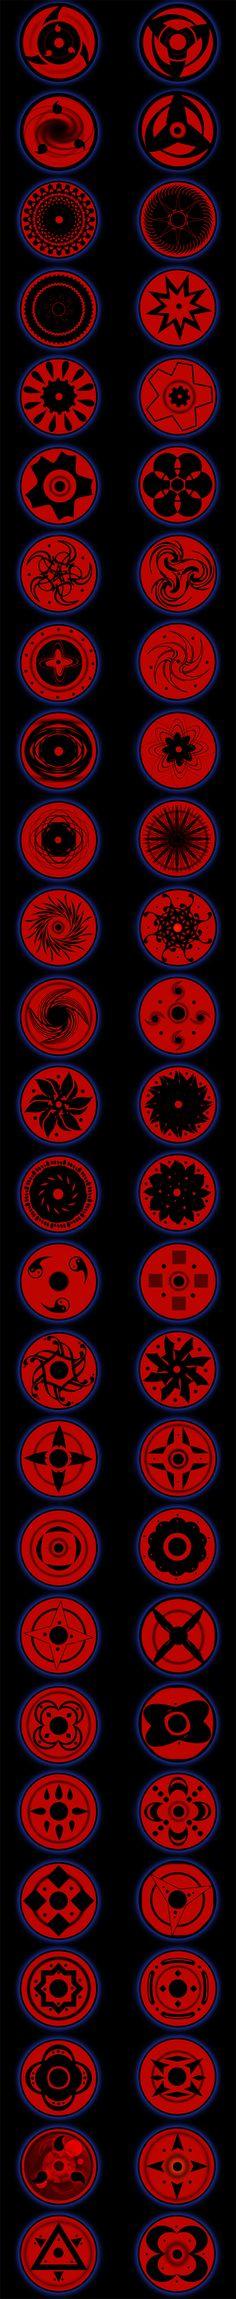 I want these powers! Anime Naruto, Manga Anime, Naruto Eyes, Naruto Shippuden Sasuke, Sarada Uchiha, Naruto Kakashi, Naruto Art, Anime Eyes, Boruto